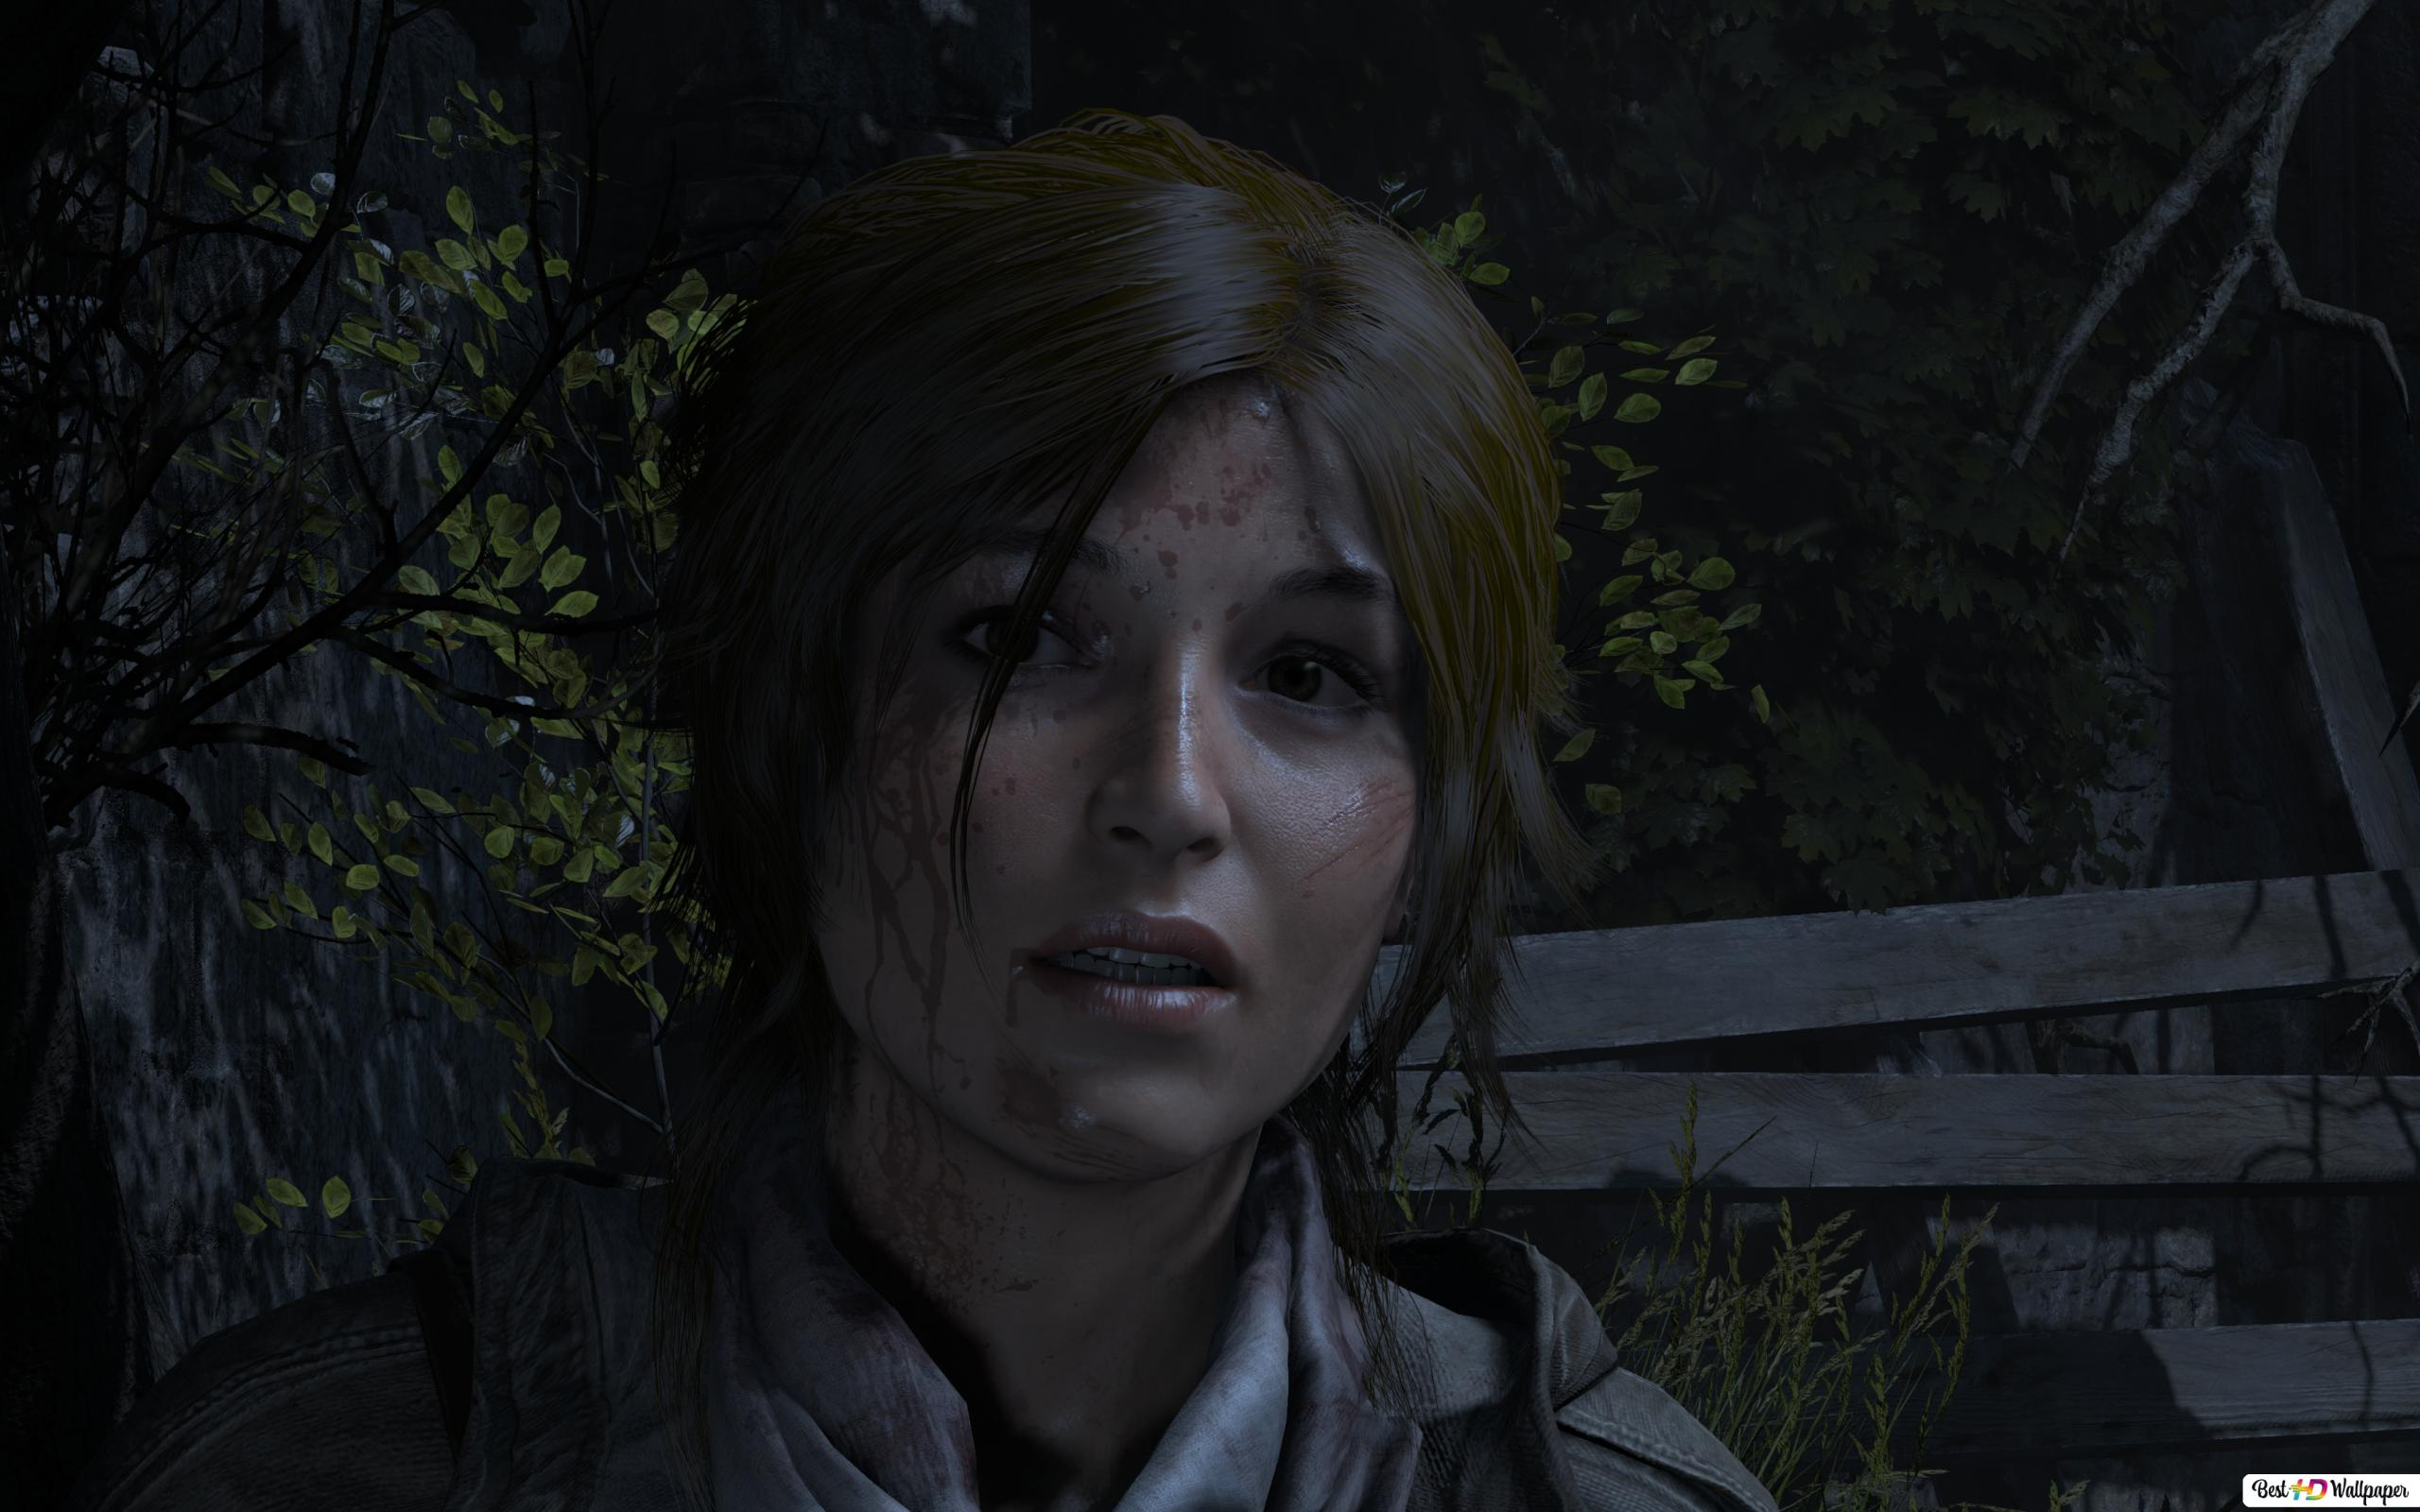 Lara Croft Tomb Raider Hd Wallpaper Download